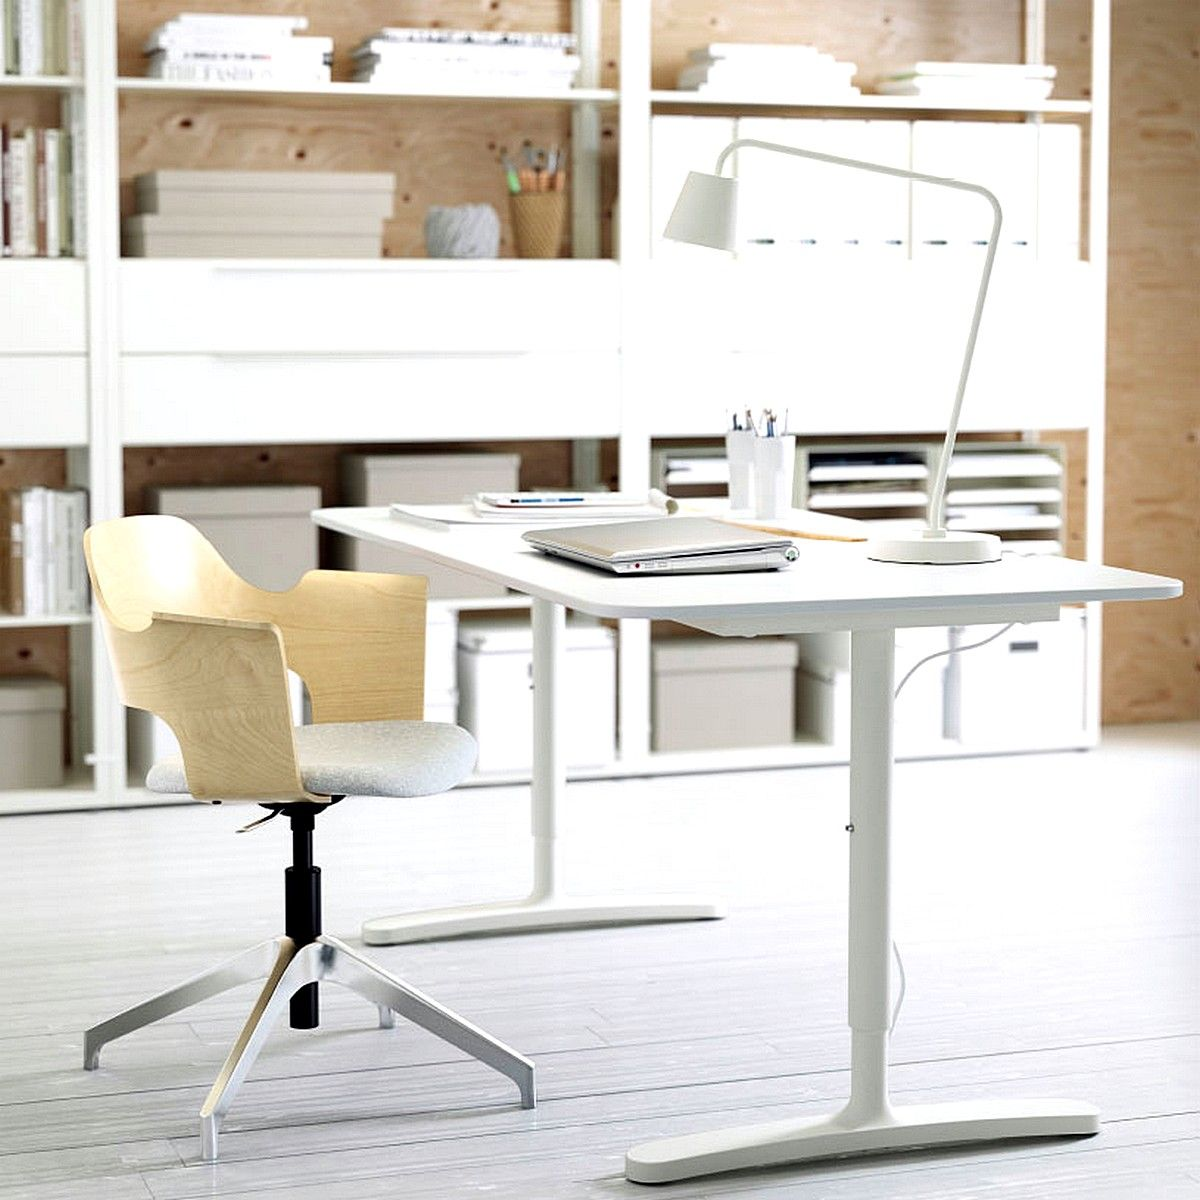 IKEA BEKANT Desk White in a Home Office Ikea home office